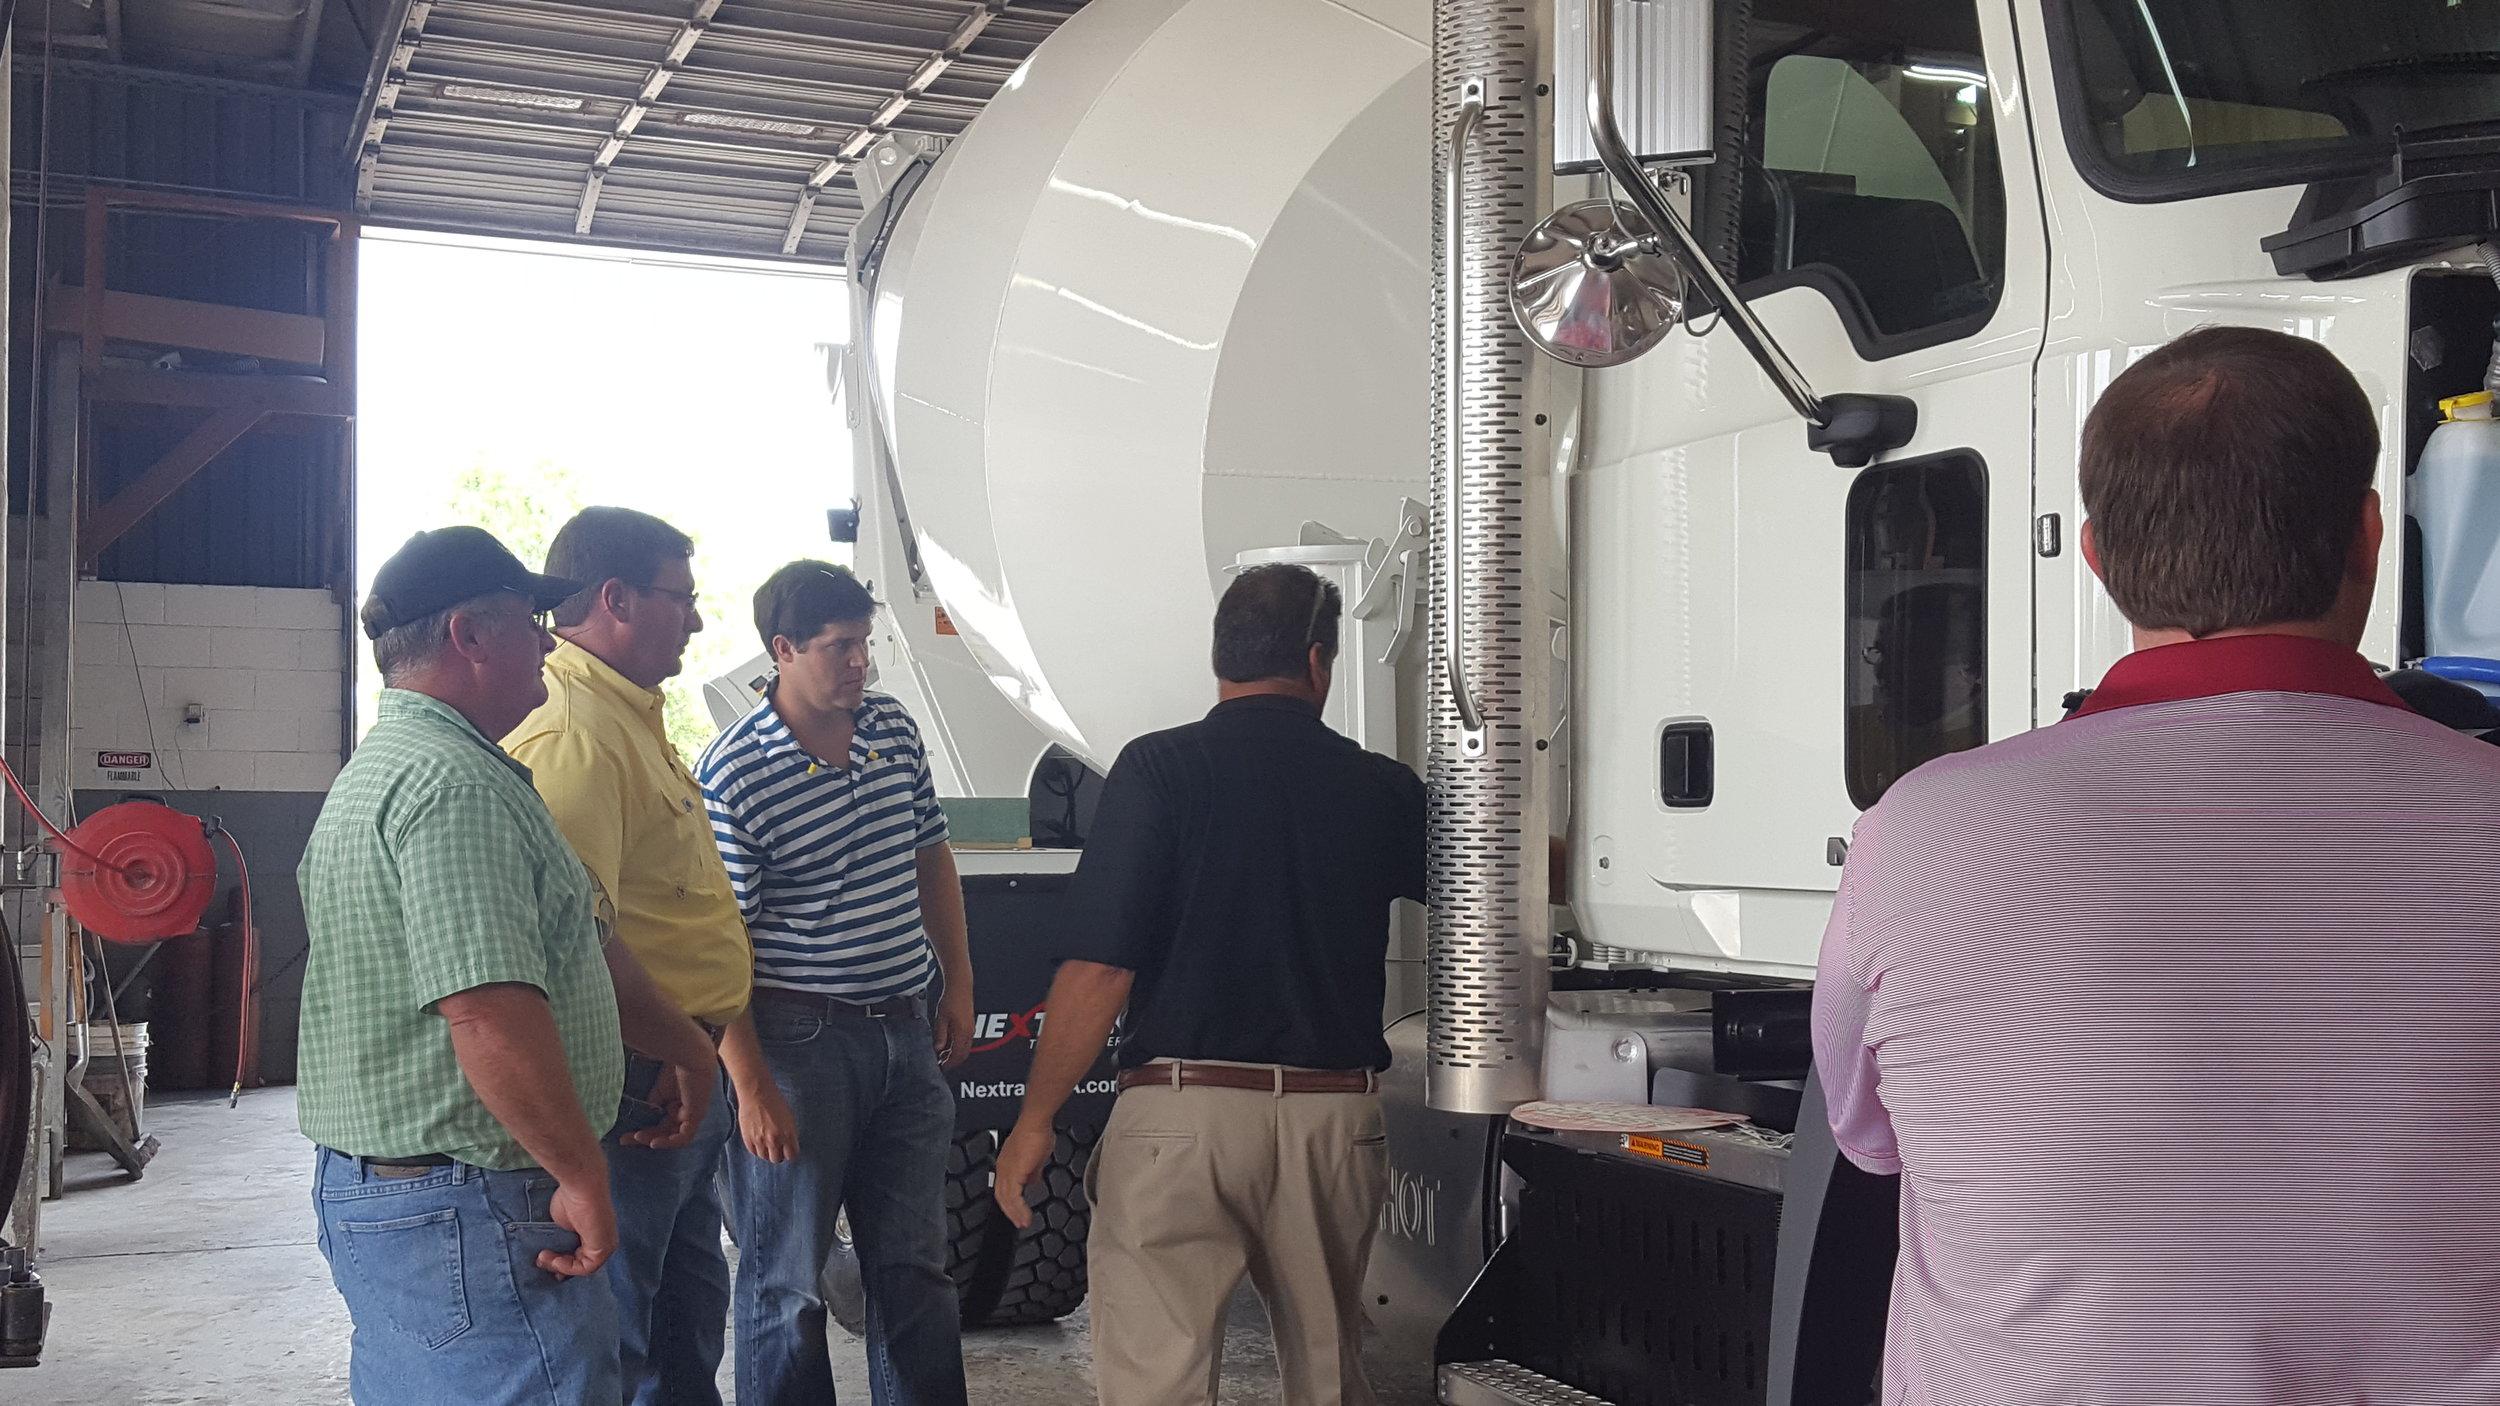 Rep. Jason Shaw, Rep. Dominic LaRicca, and Rep. John Corbett on a plant tour in Valdosta, GA.